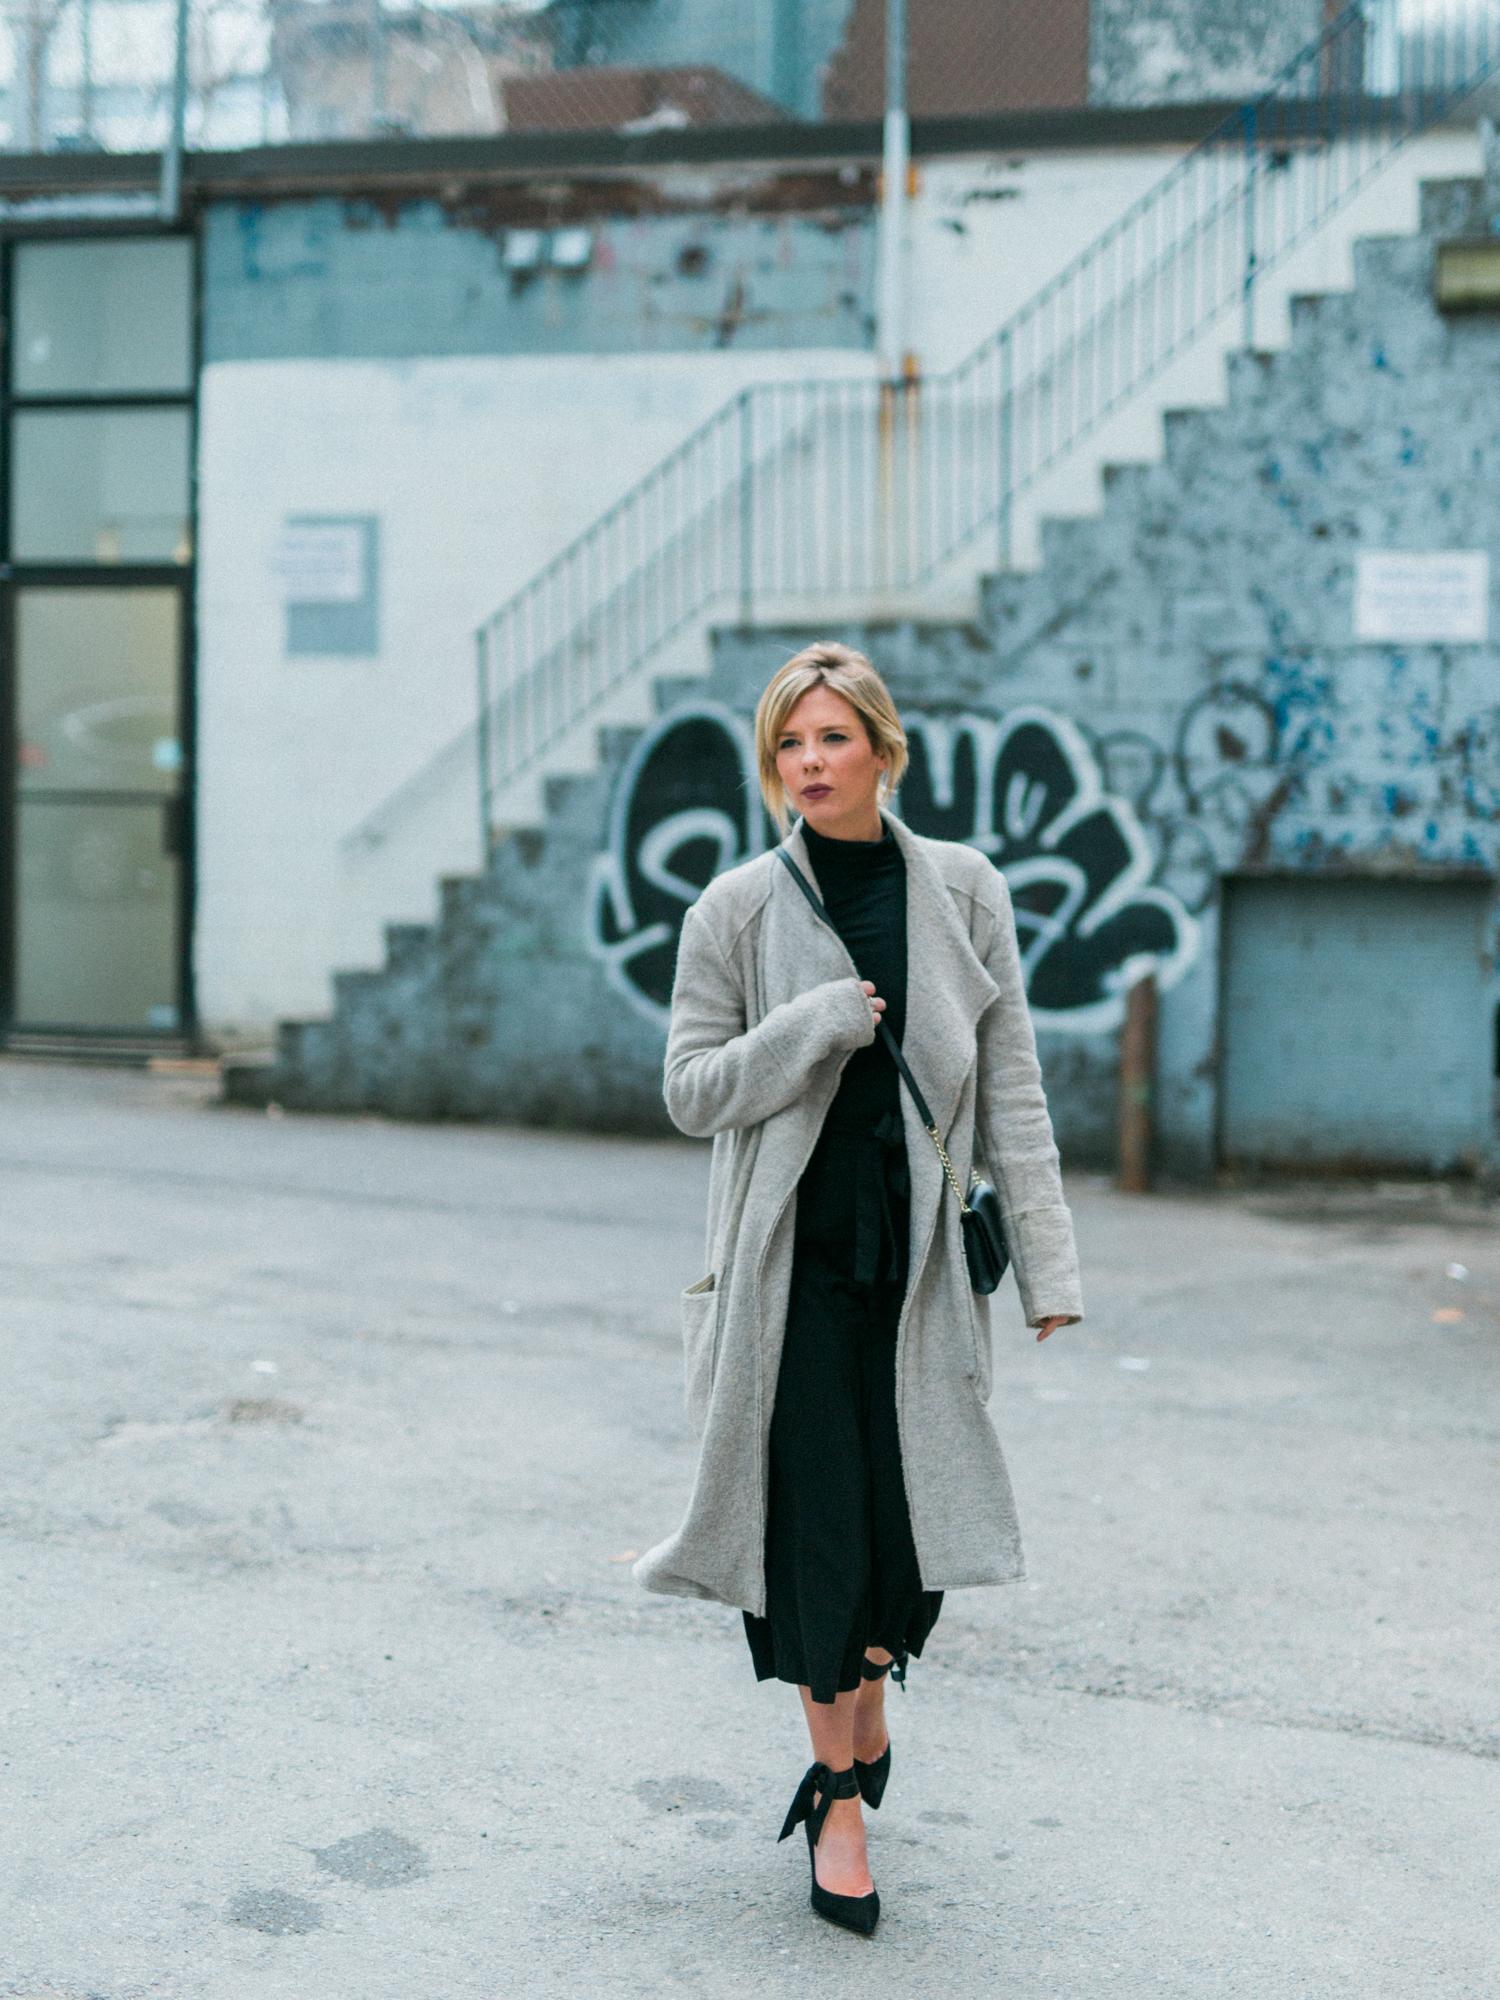 DanielleGirouxPhotography_Toronto_Portrait_StreetPhotography_0C6A1172.jpg